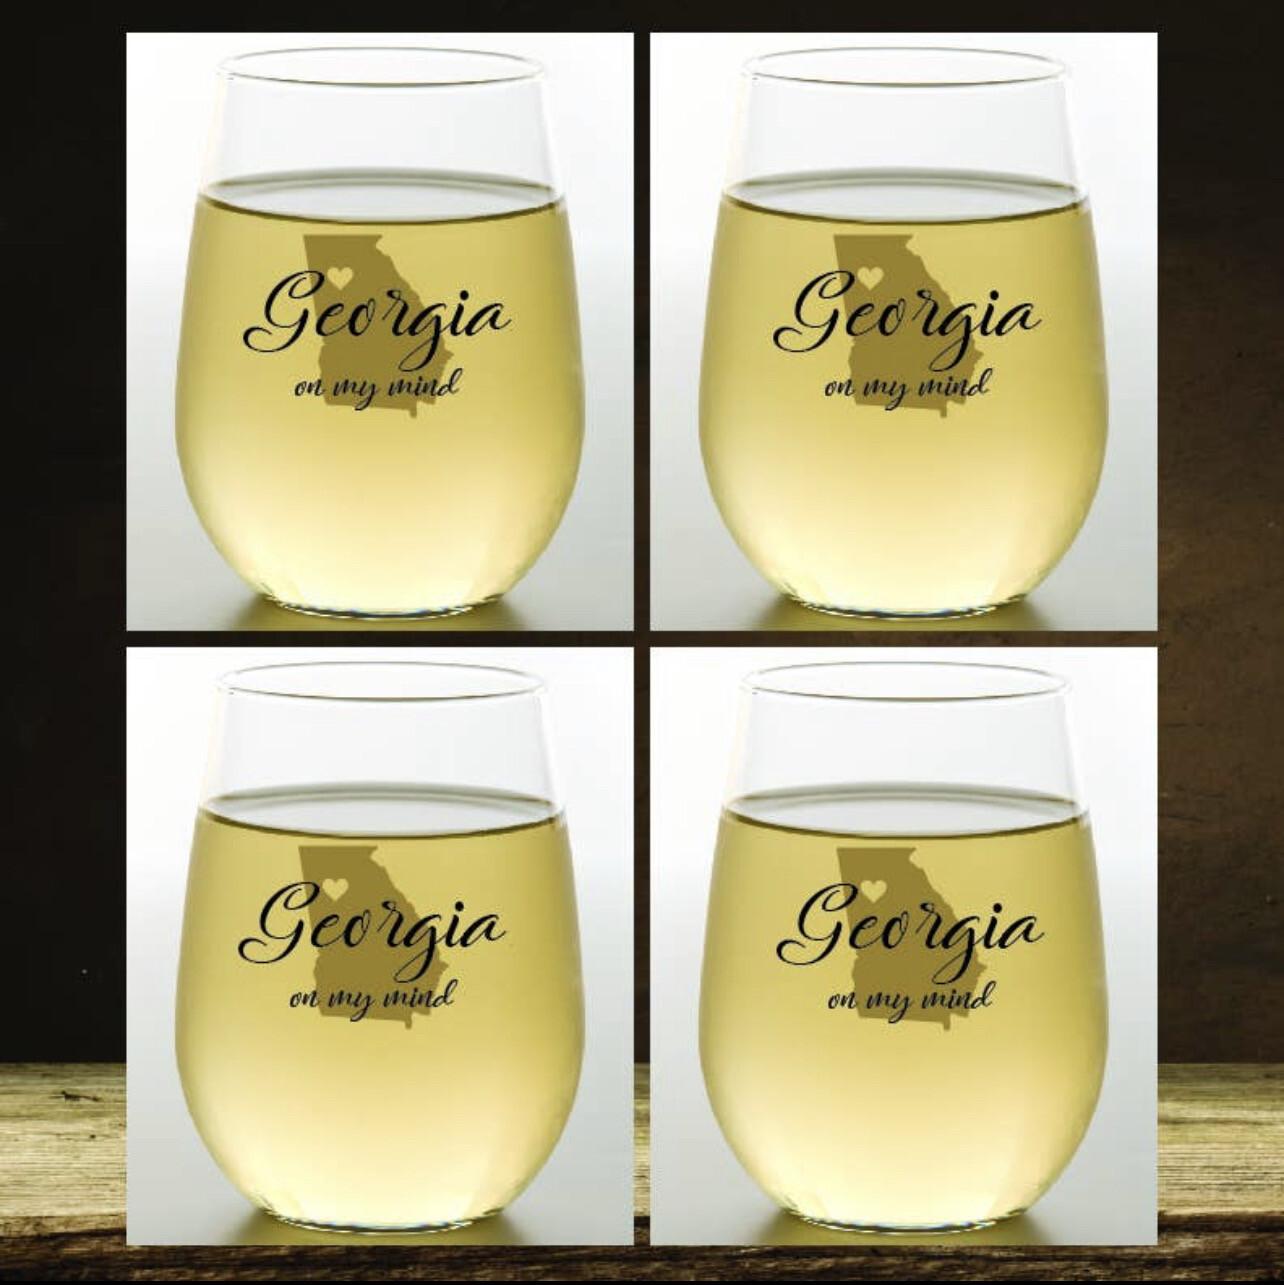 Set of 4 Georgia Shatterproof Wine Glasses